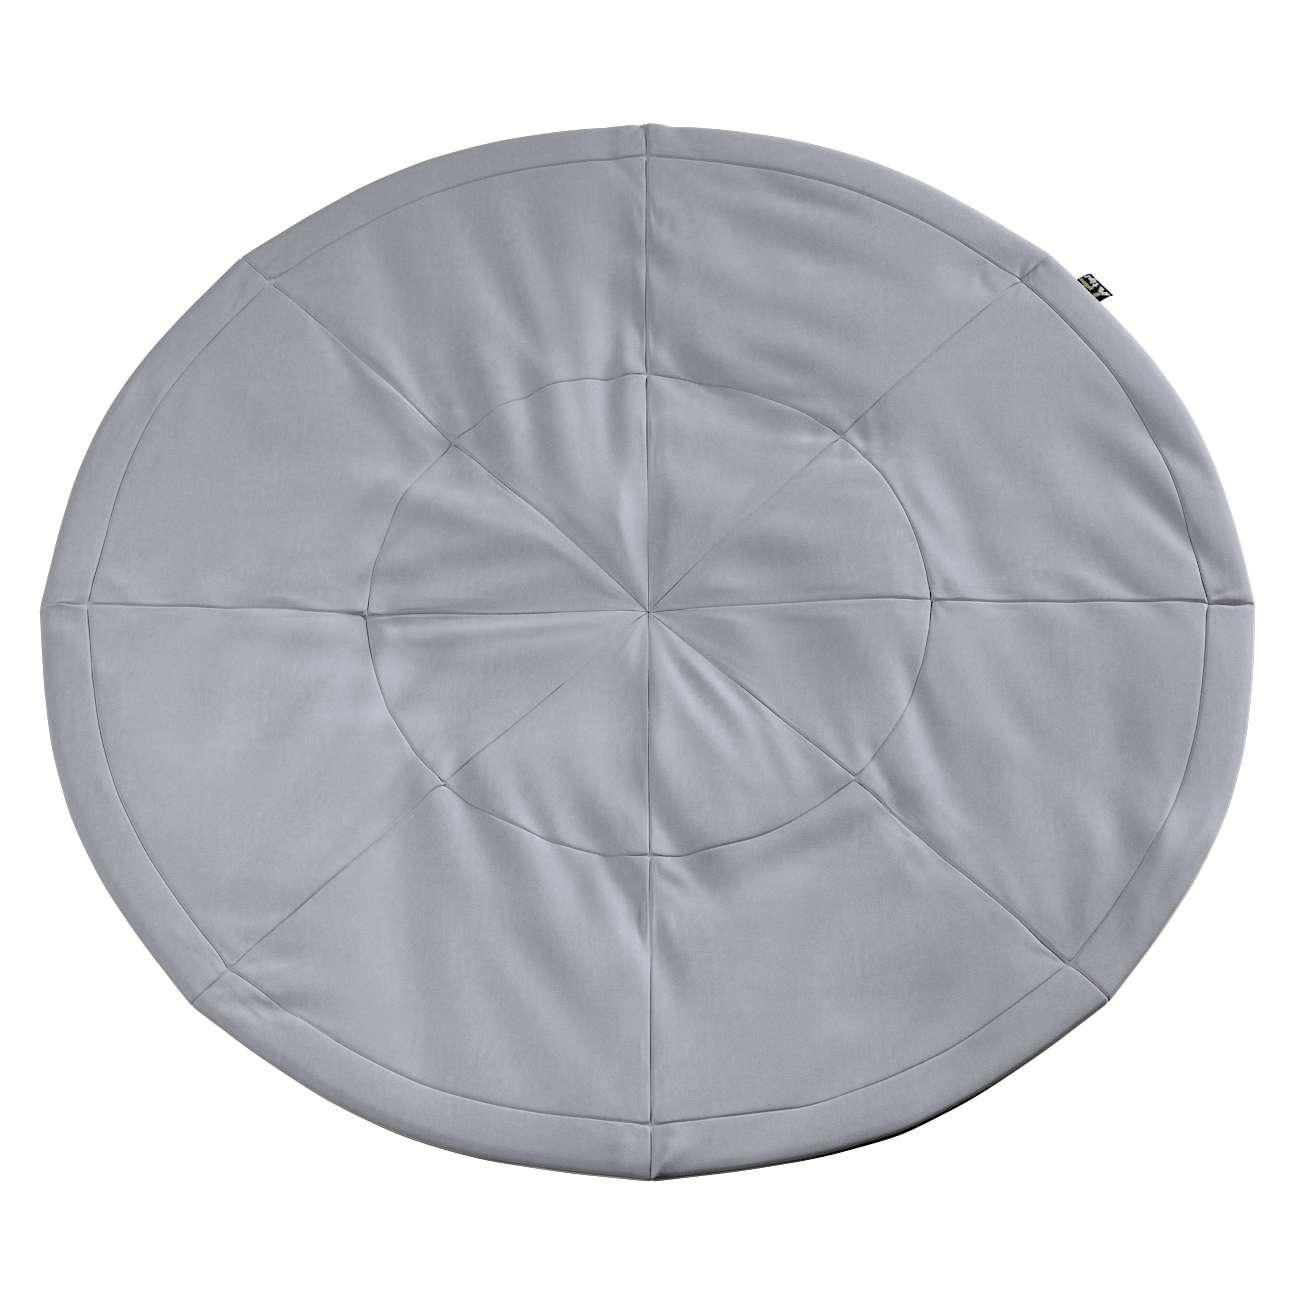 Round mat in collection Posh Velvet, fabric: 704-24